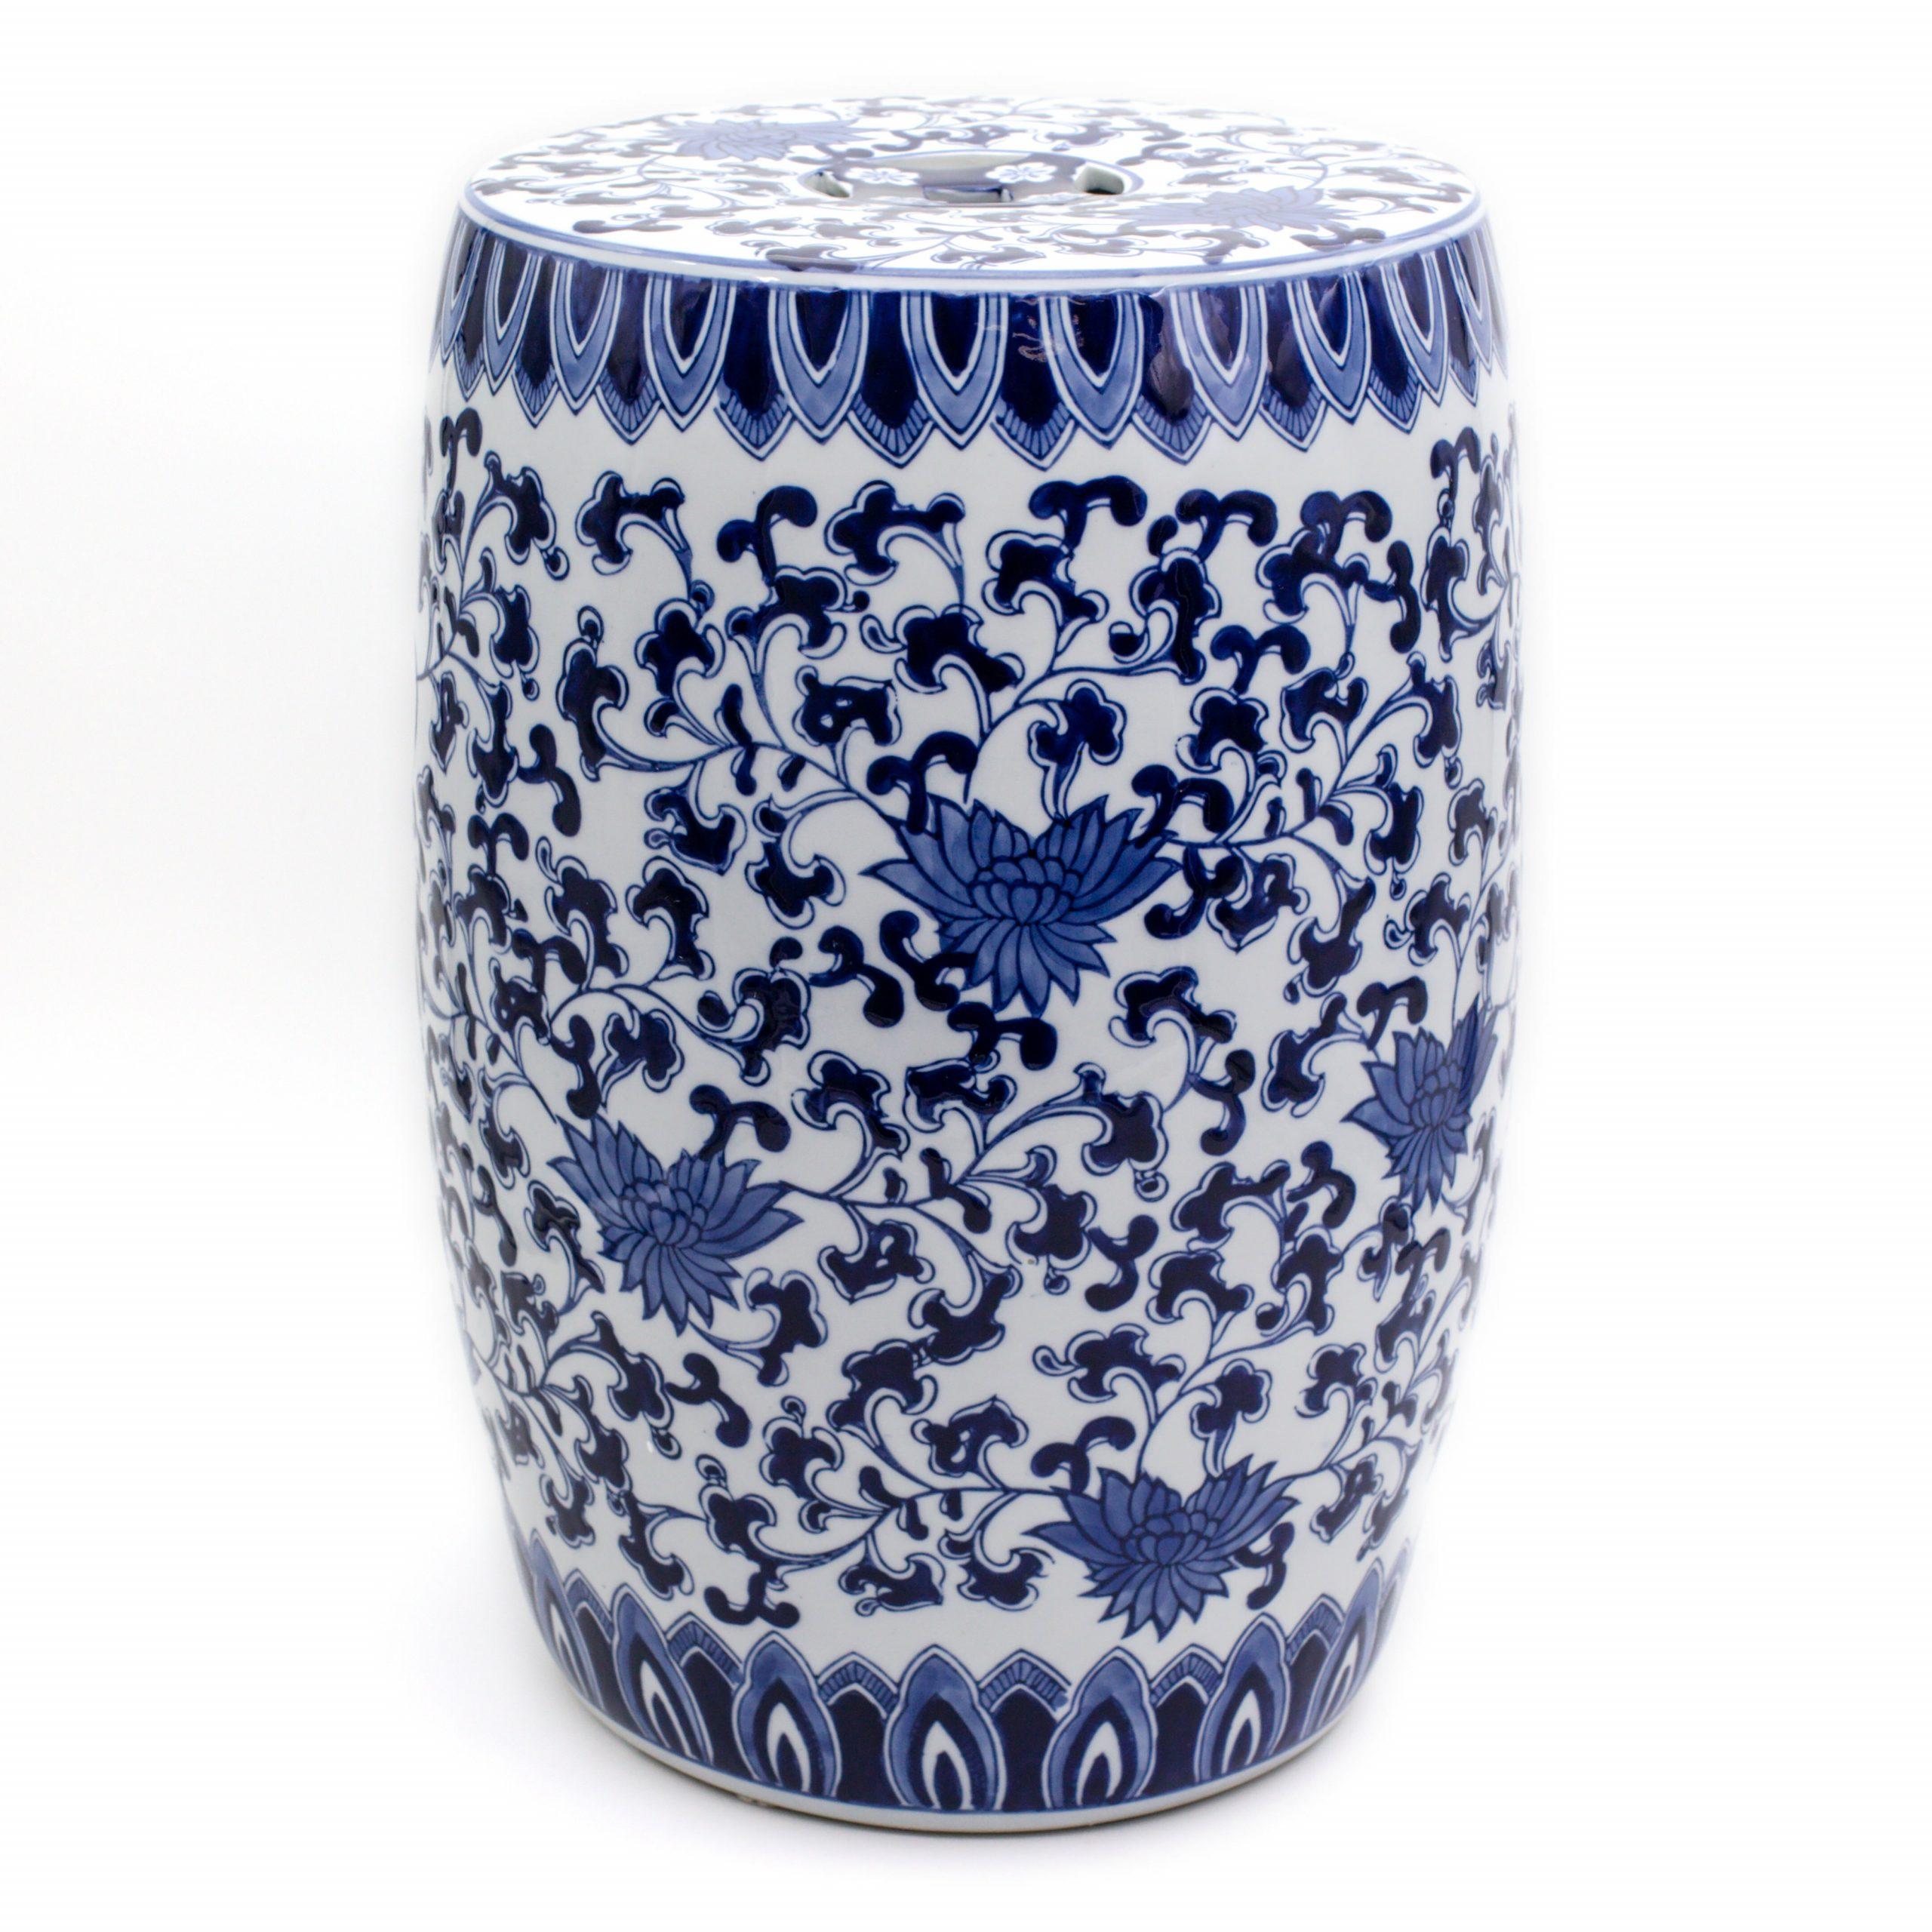 Angela Blue Lotus Ceramic Garden Stool For Holbæk Garden Stools (View 6 of 25)